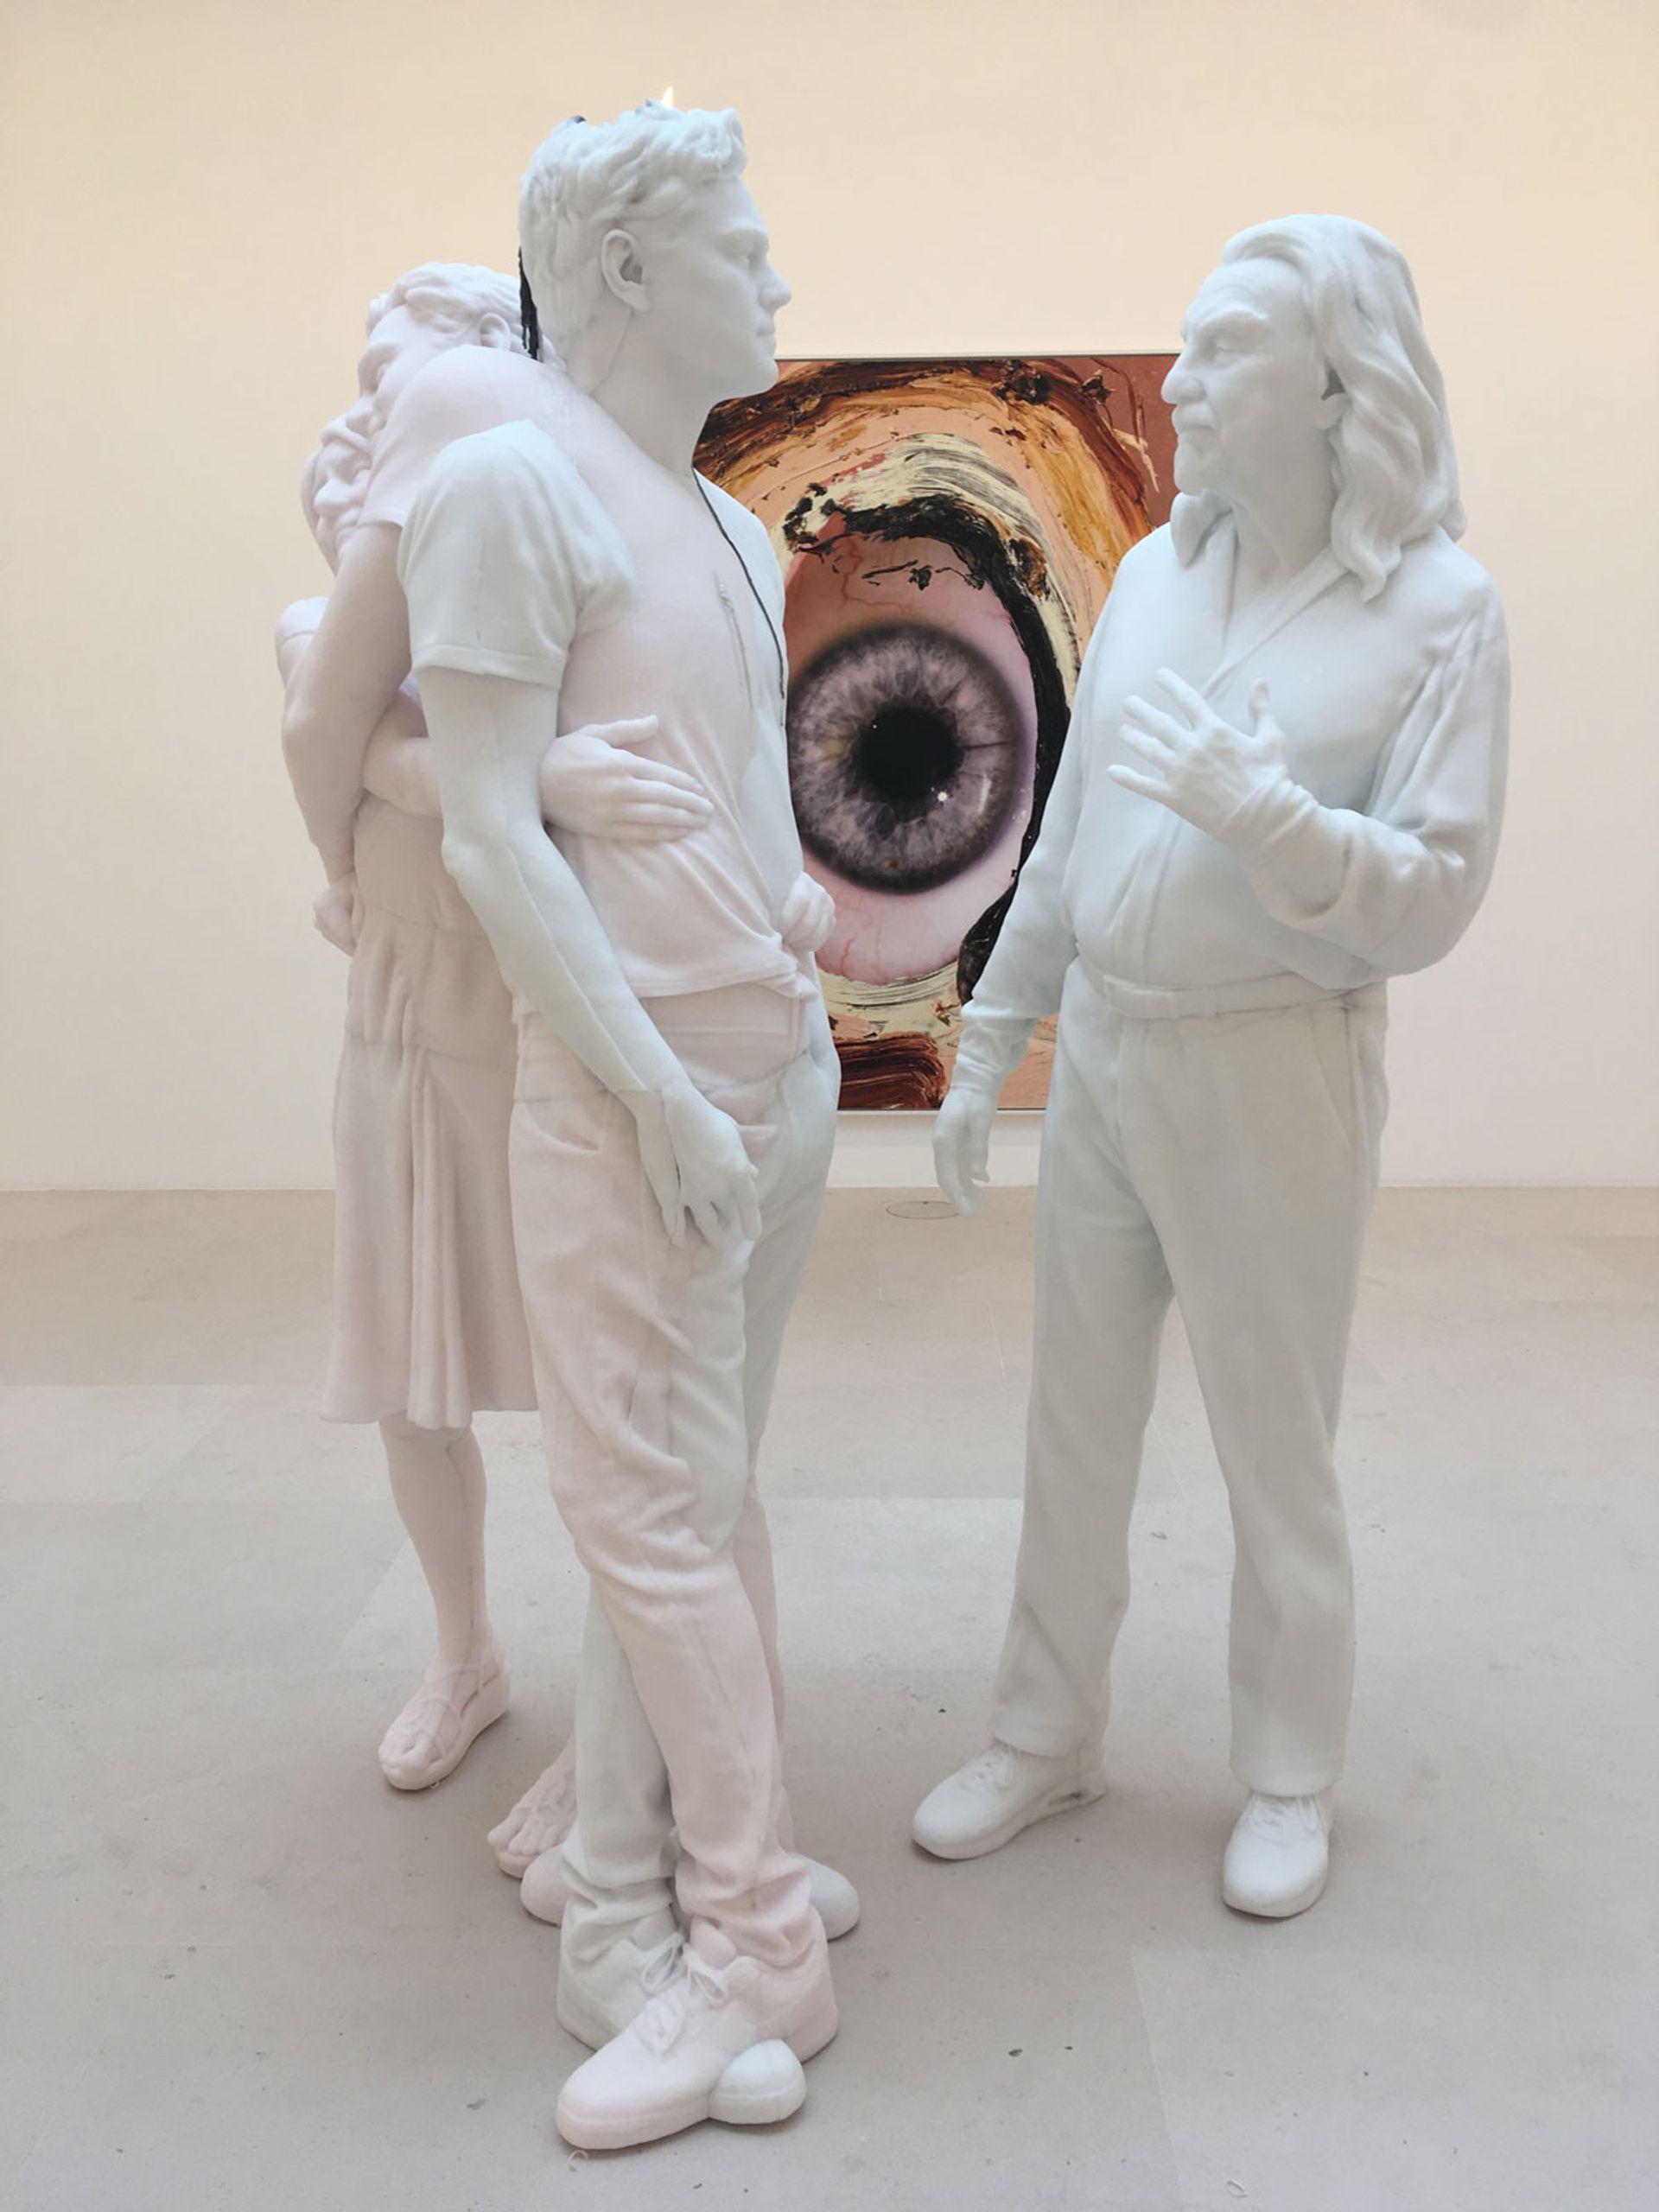 Urs Fischer's Leo on show at Gagosian gallery in Paris © Photo: Anna Sansom, The Art Newspaper